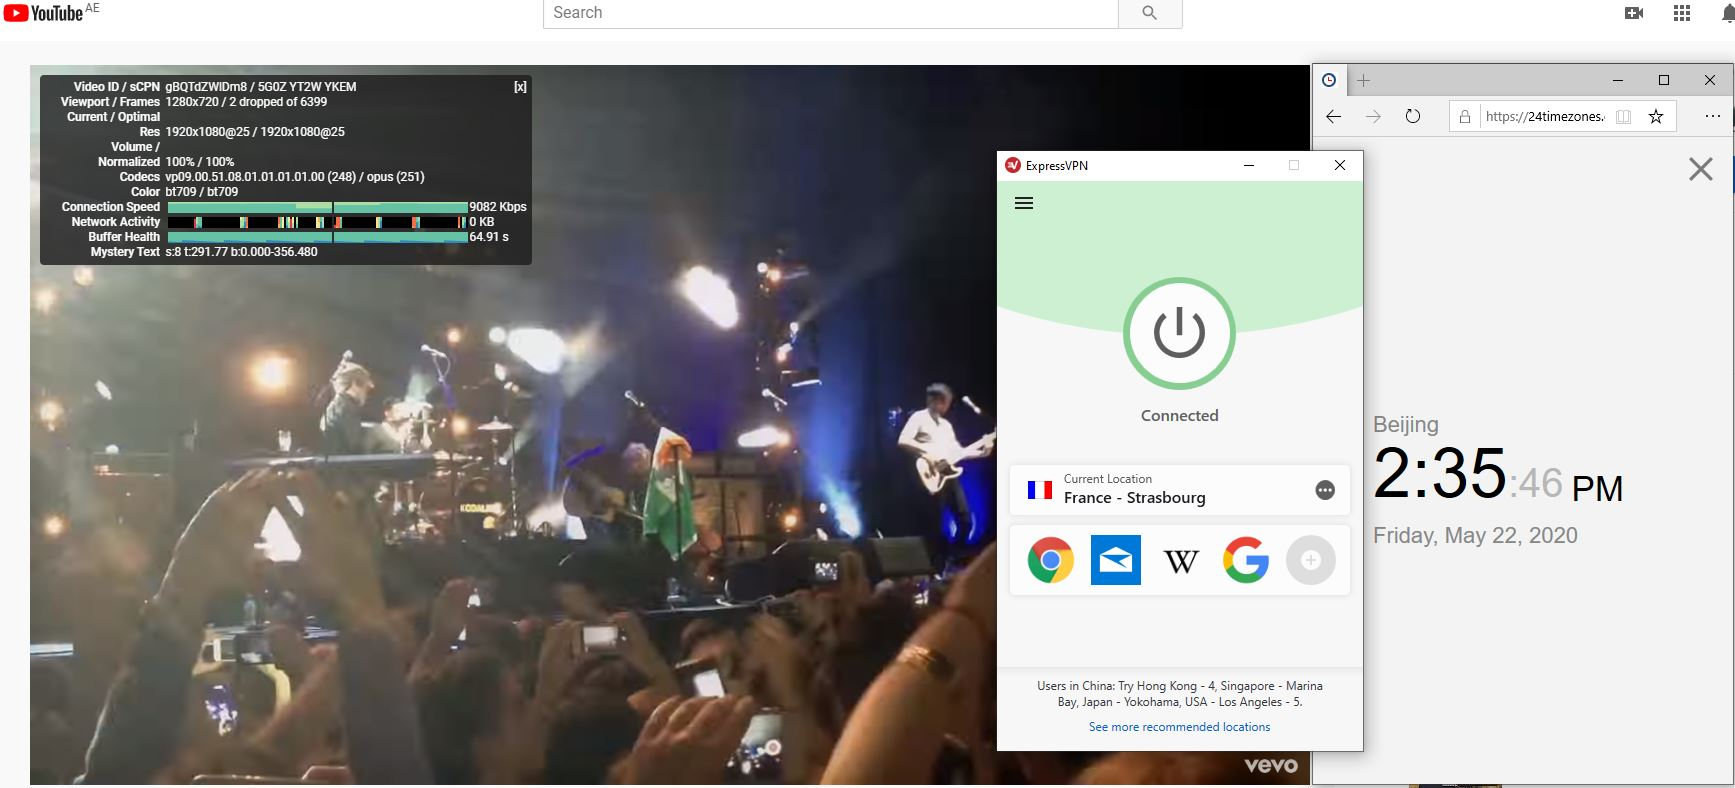 Windows10 ExpressVPN France - Strasbourg 中国VPN 翻墙 科学上网 youtube测速-20200522-1